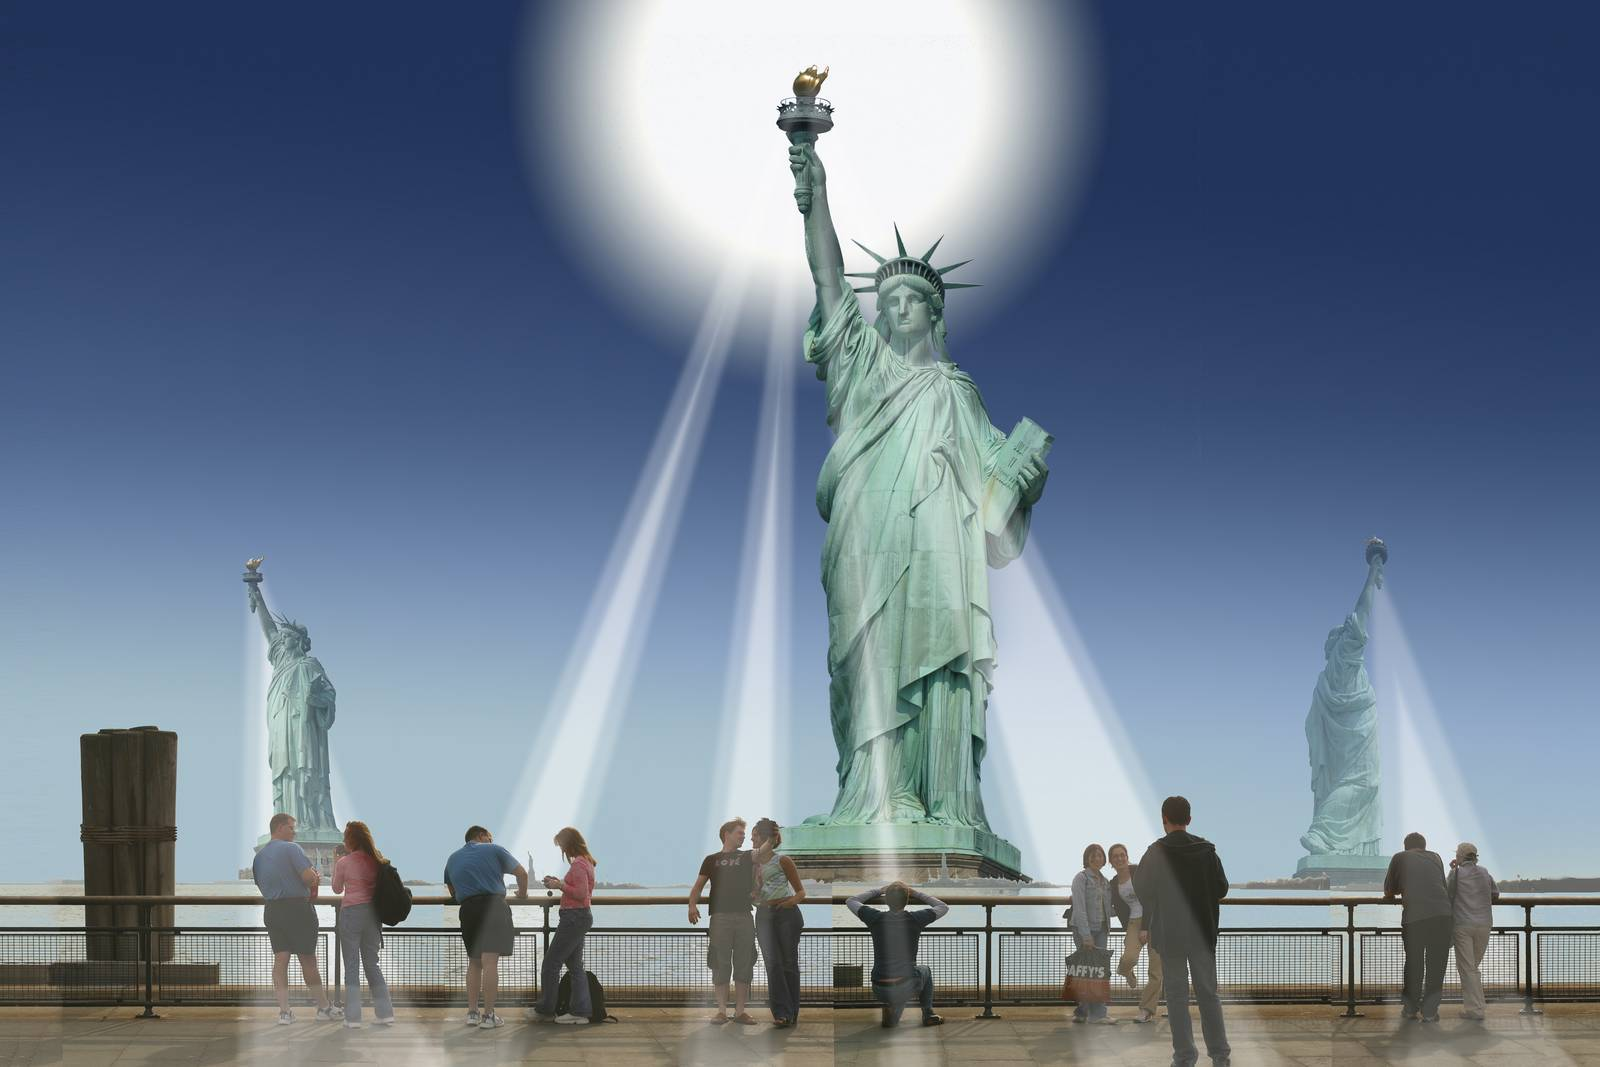 Liberty pier, New York